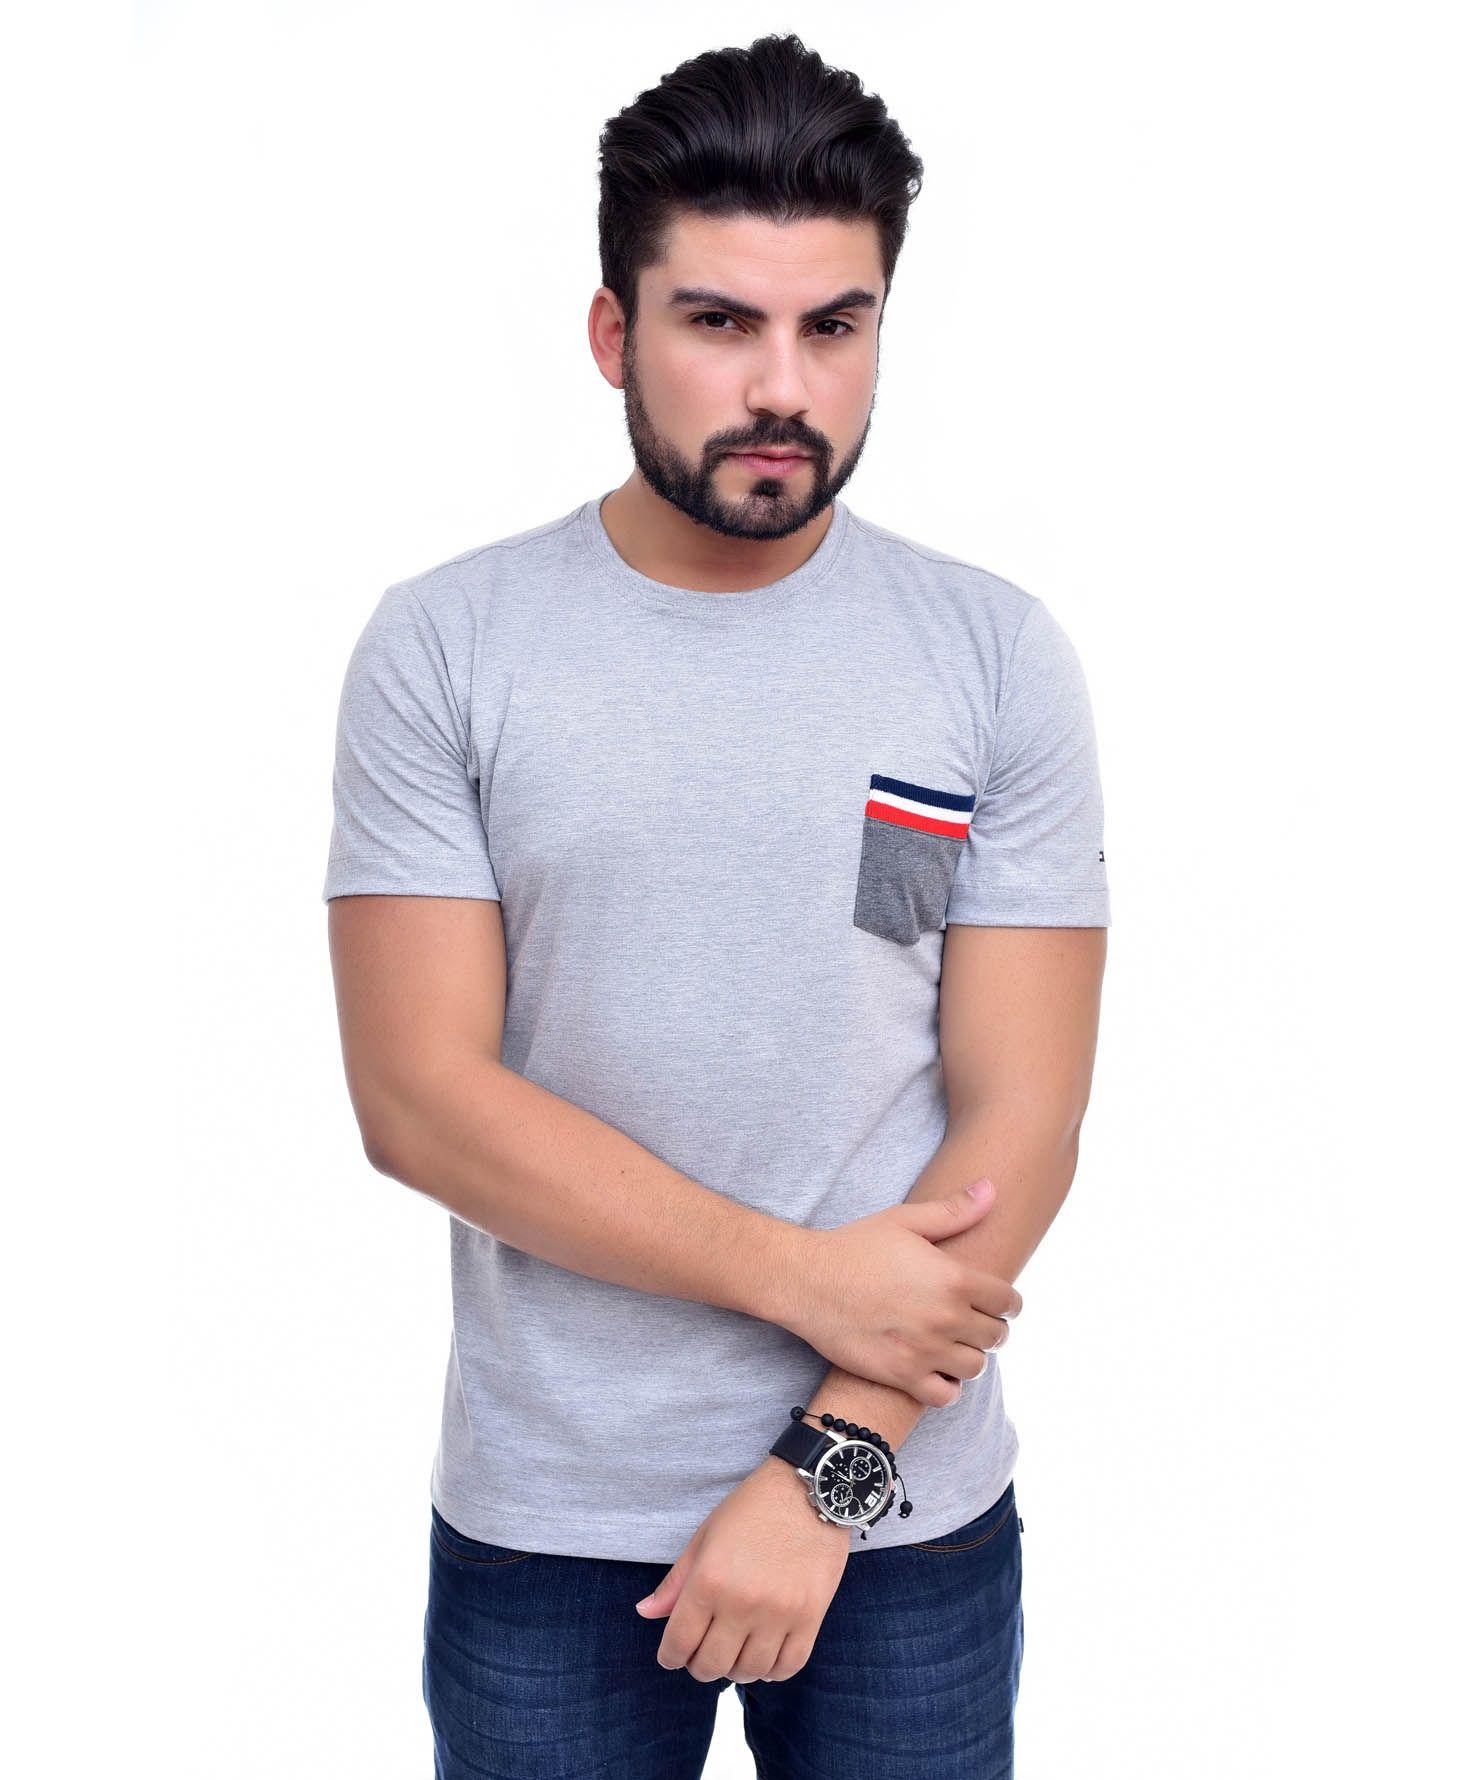 Camiseta Bolso TH Mescla Claro / ME